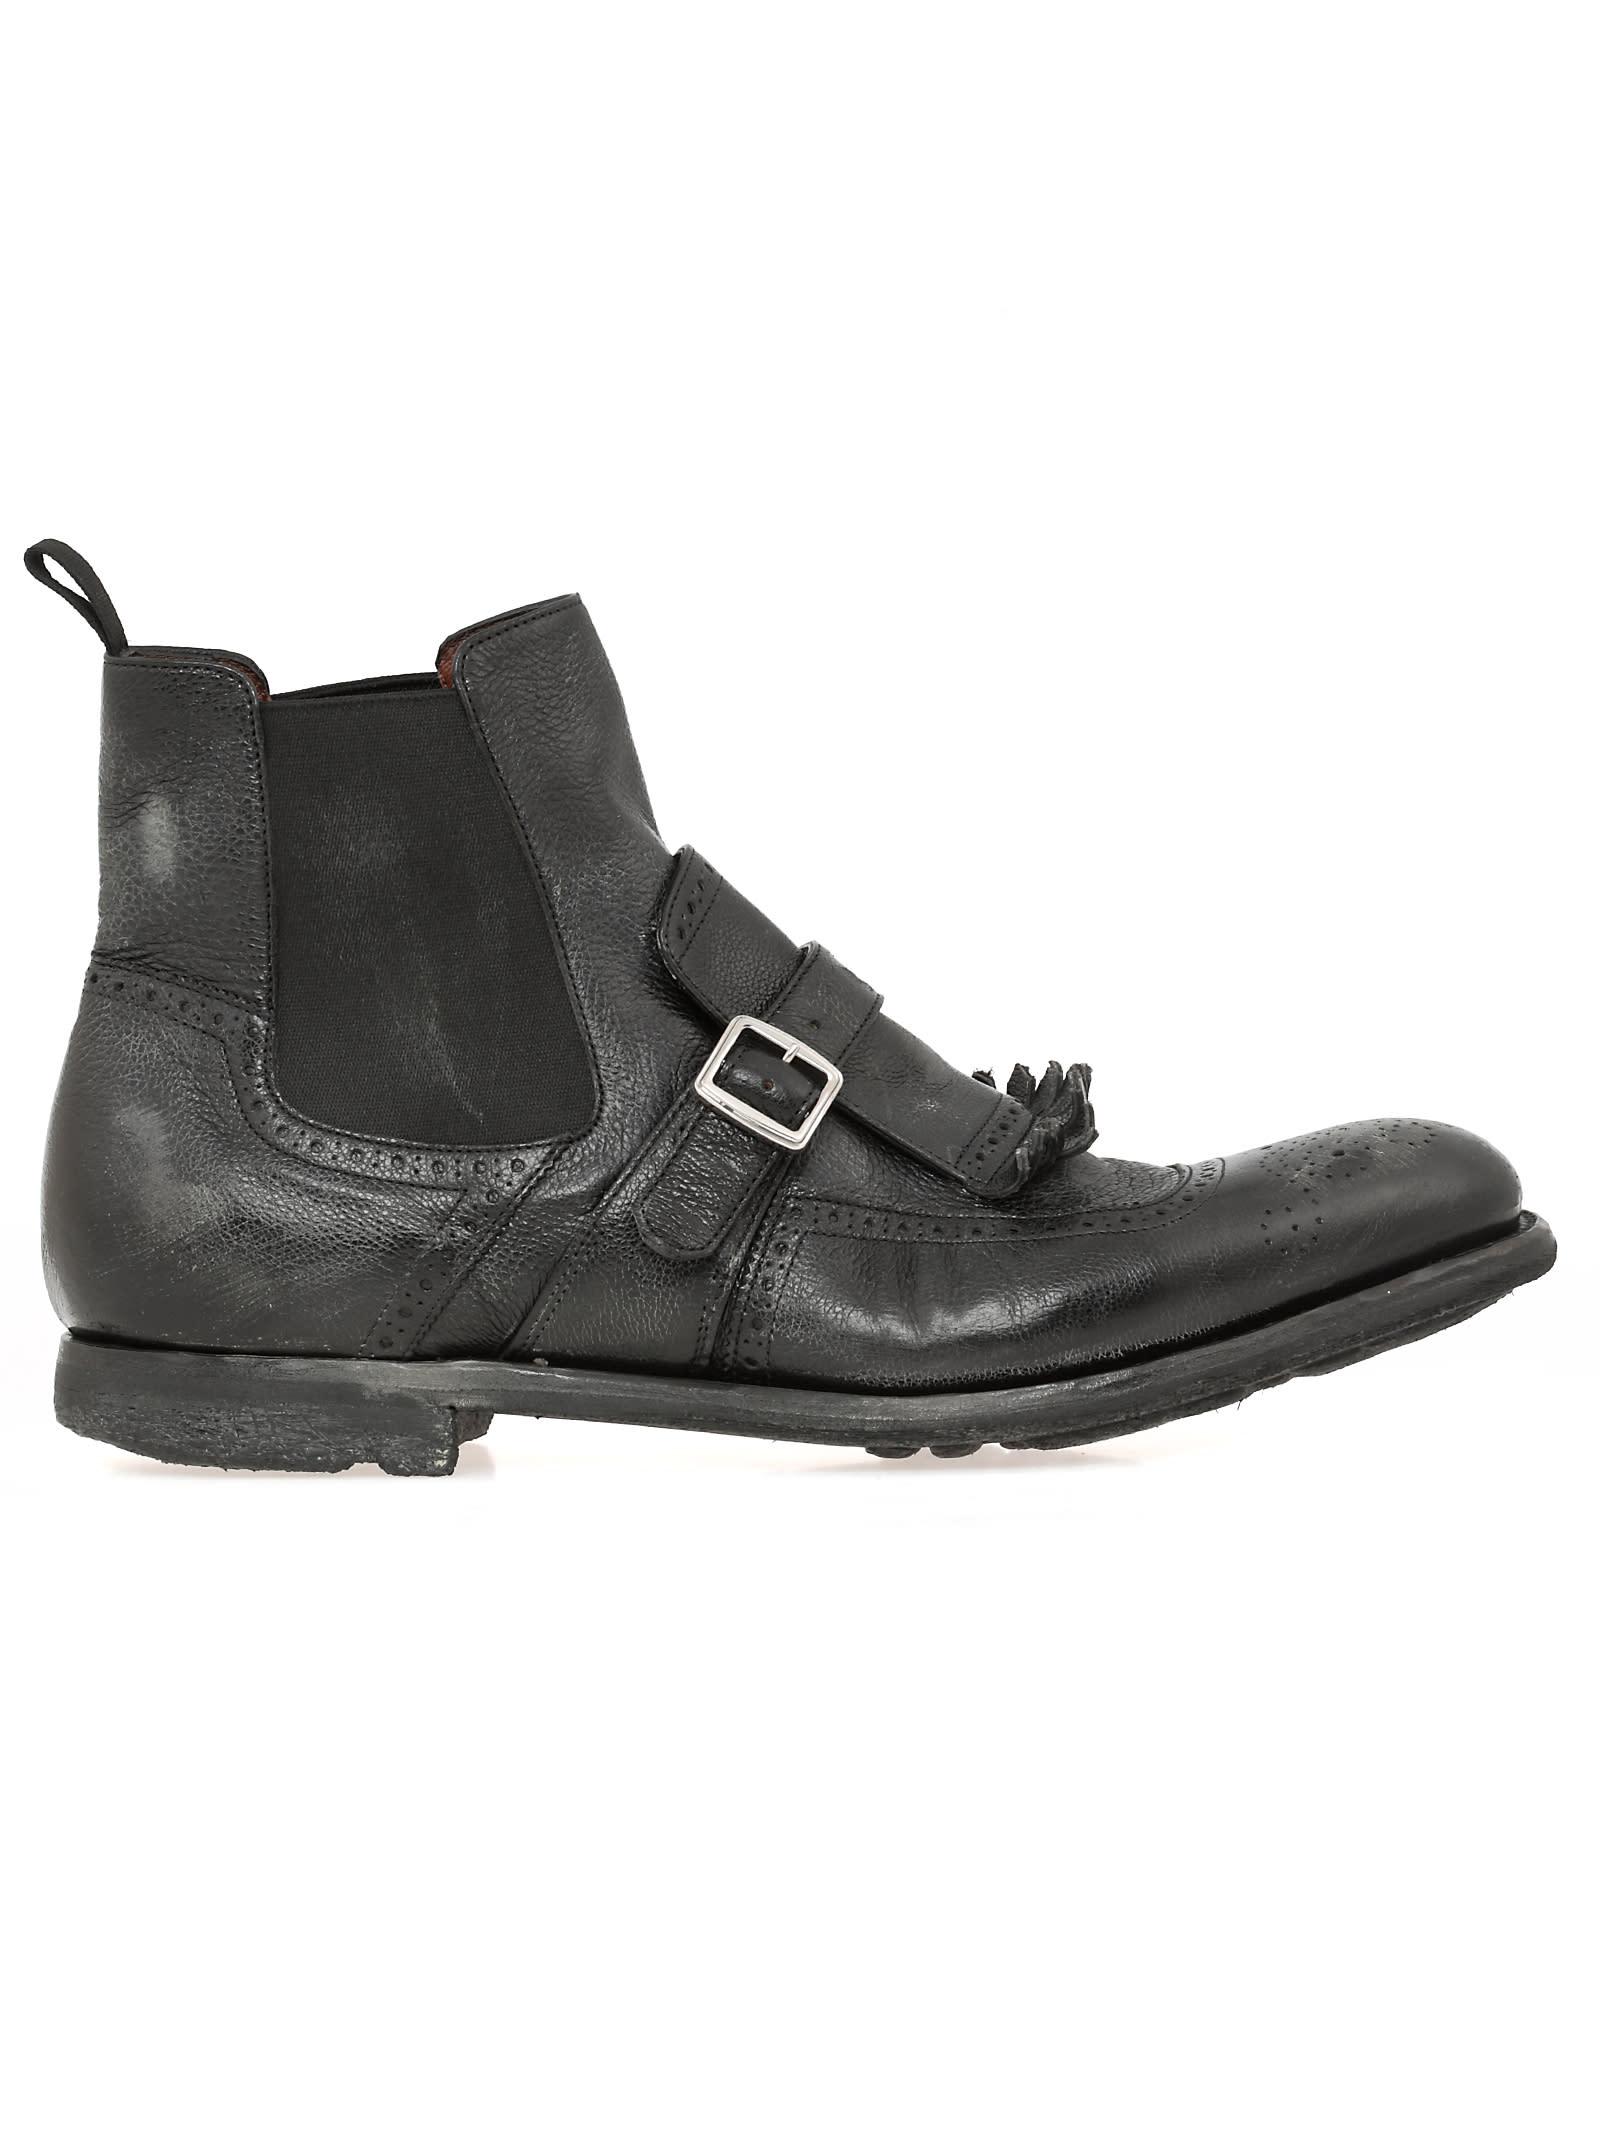 Churchs Shangai 6 Boot